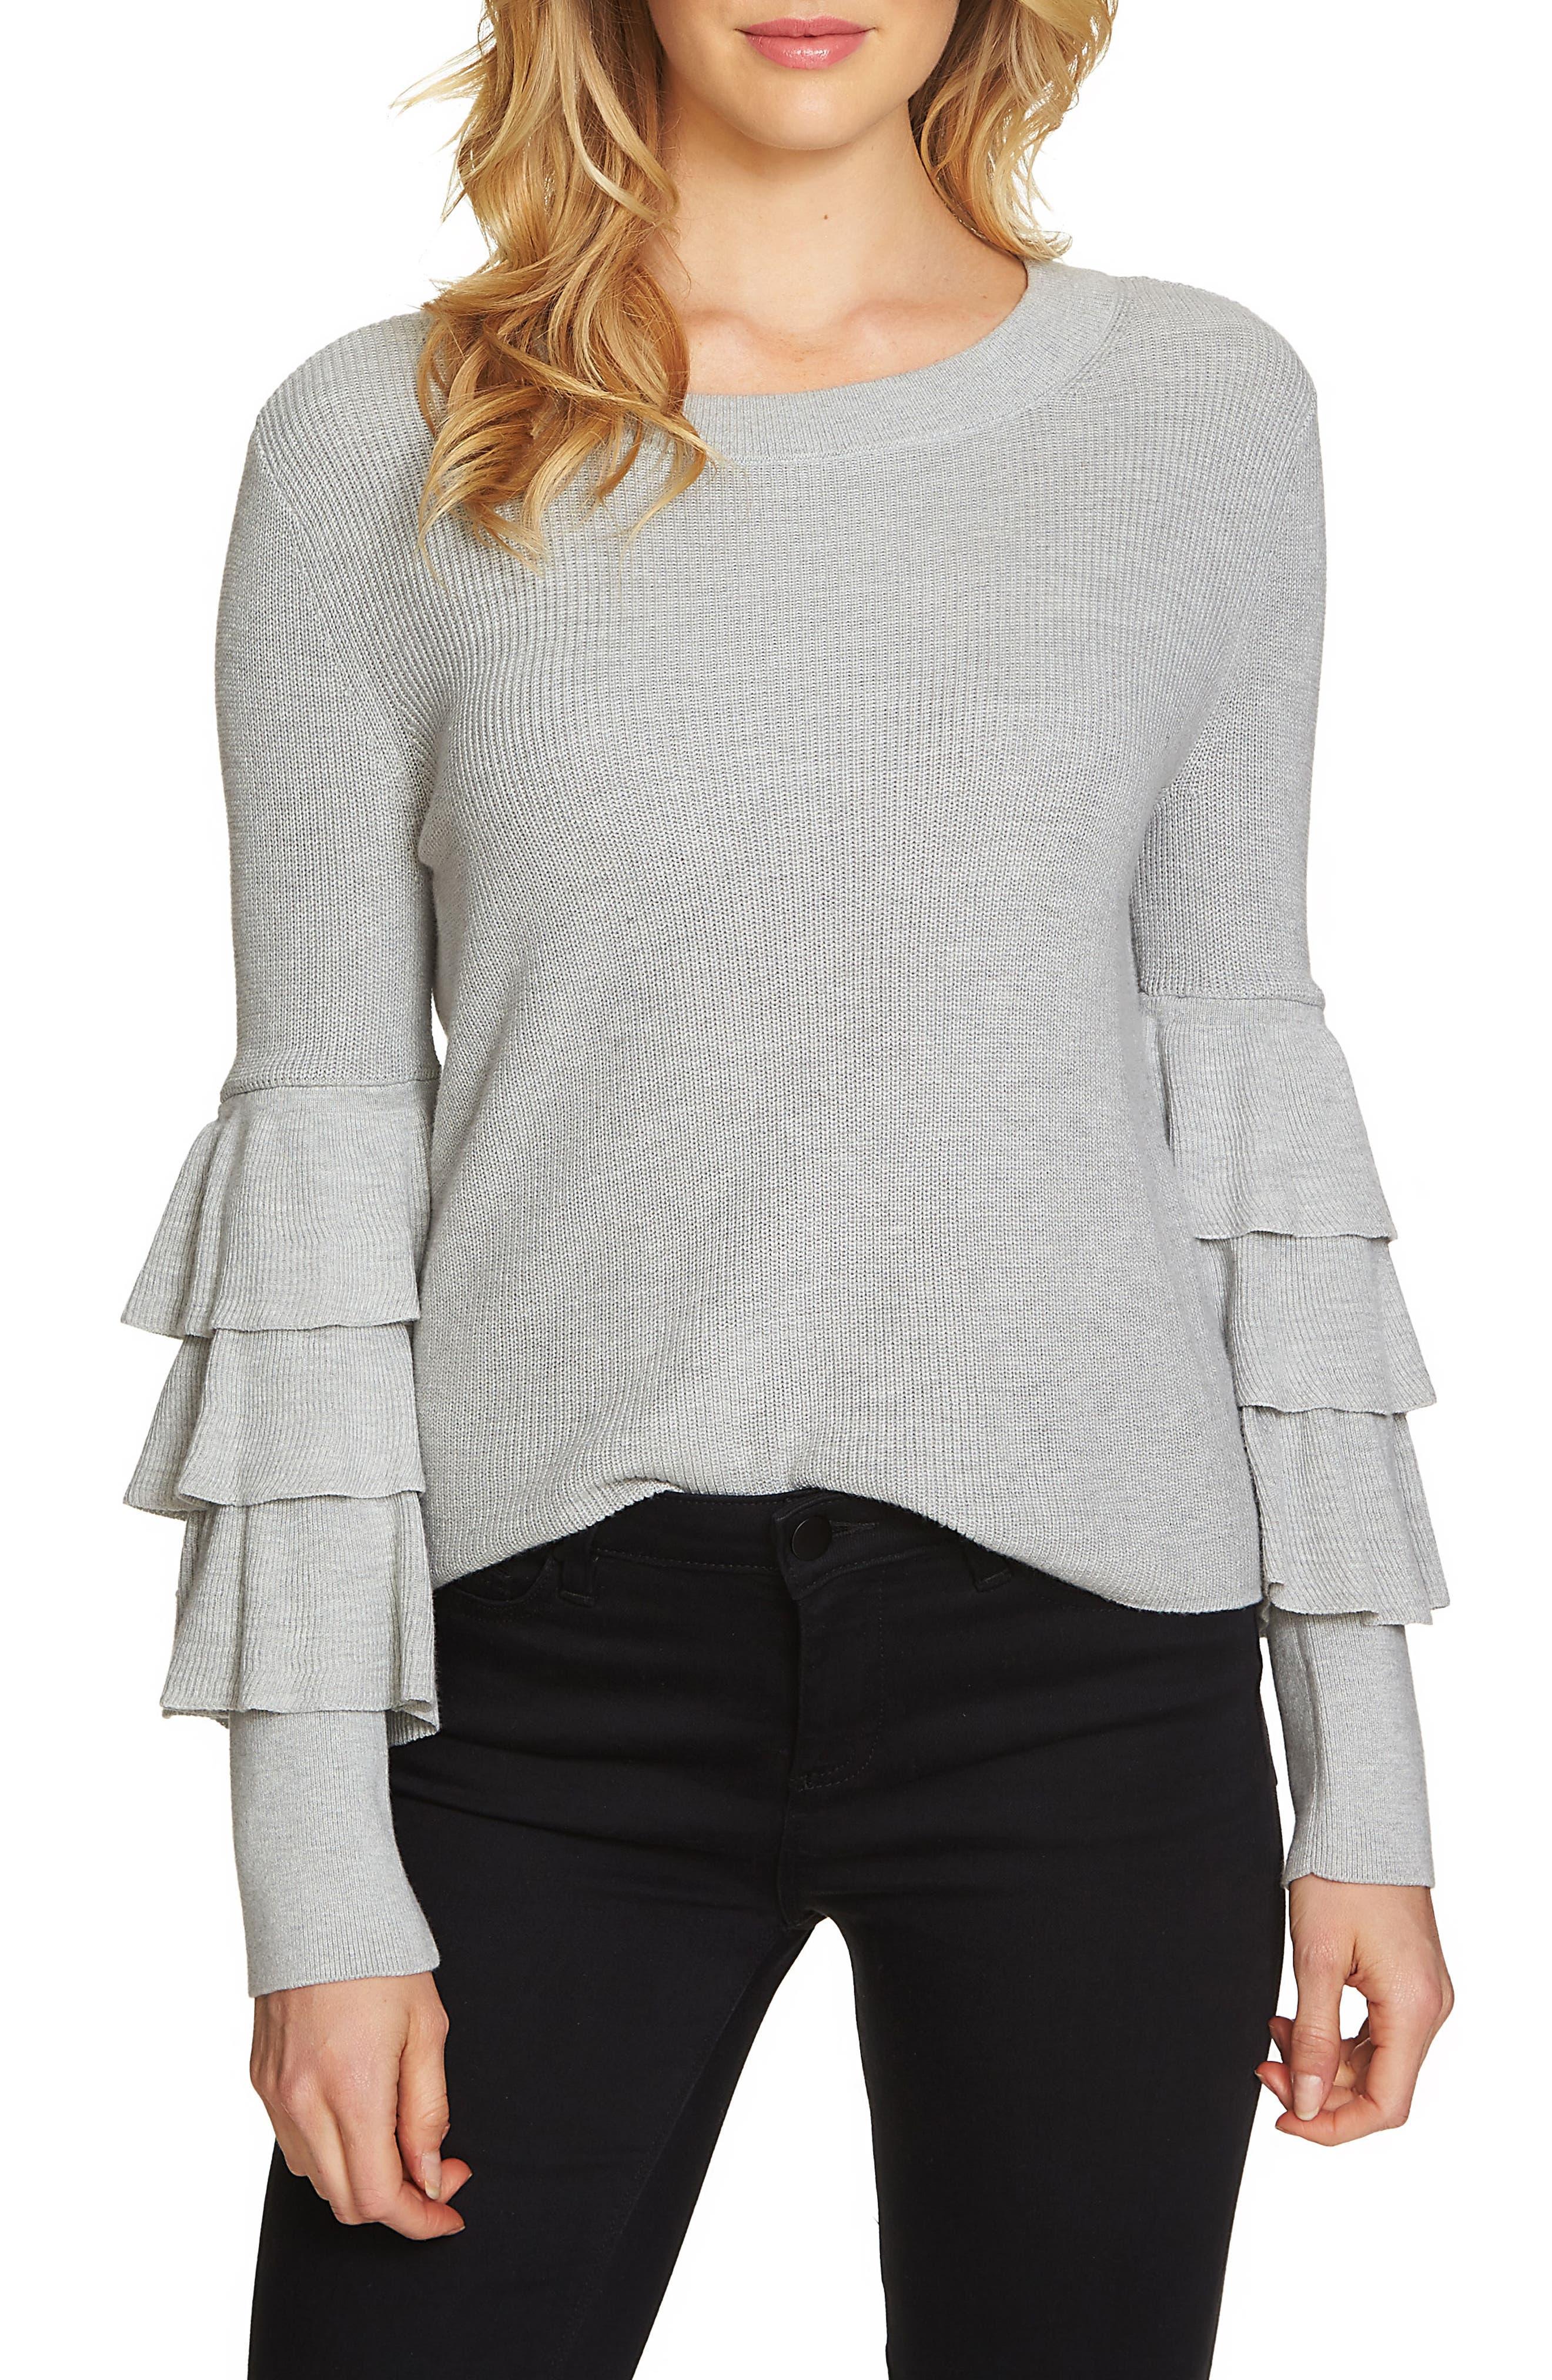 Main Image - 1.STATE Tiered Ruffle Sleeve Sweater